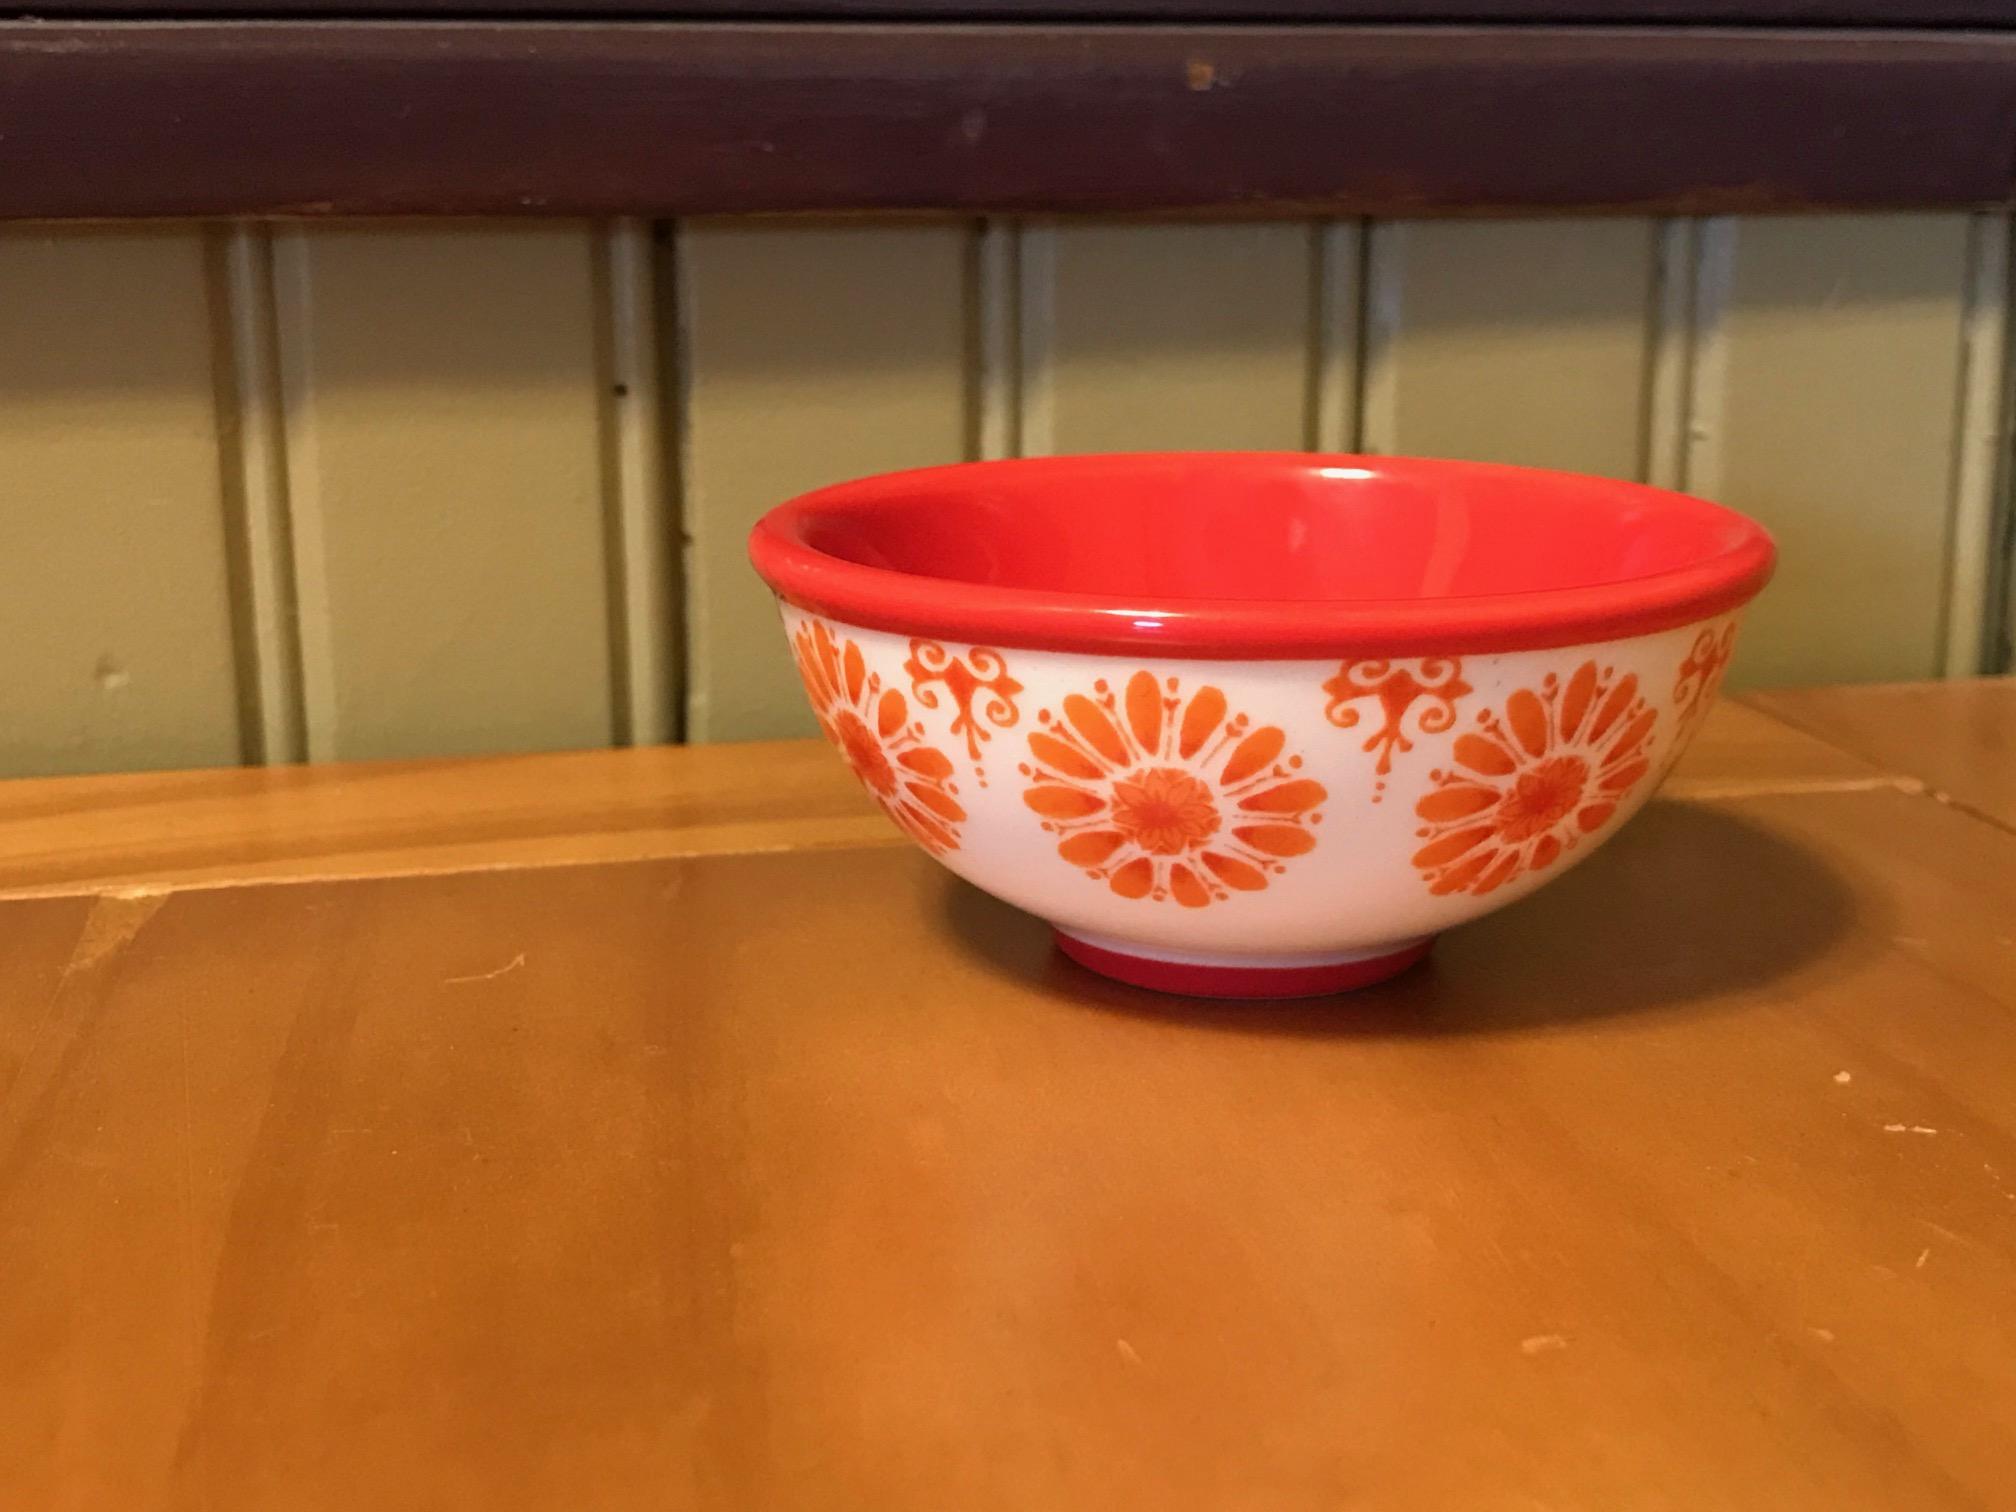 #AskTamara: Do my Pioneer Woman dishes have lead (Pb)?